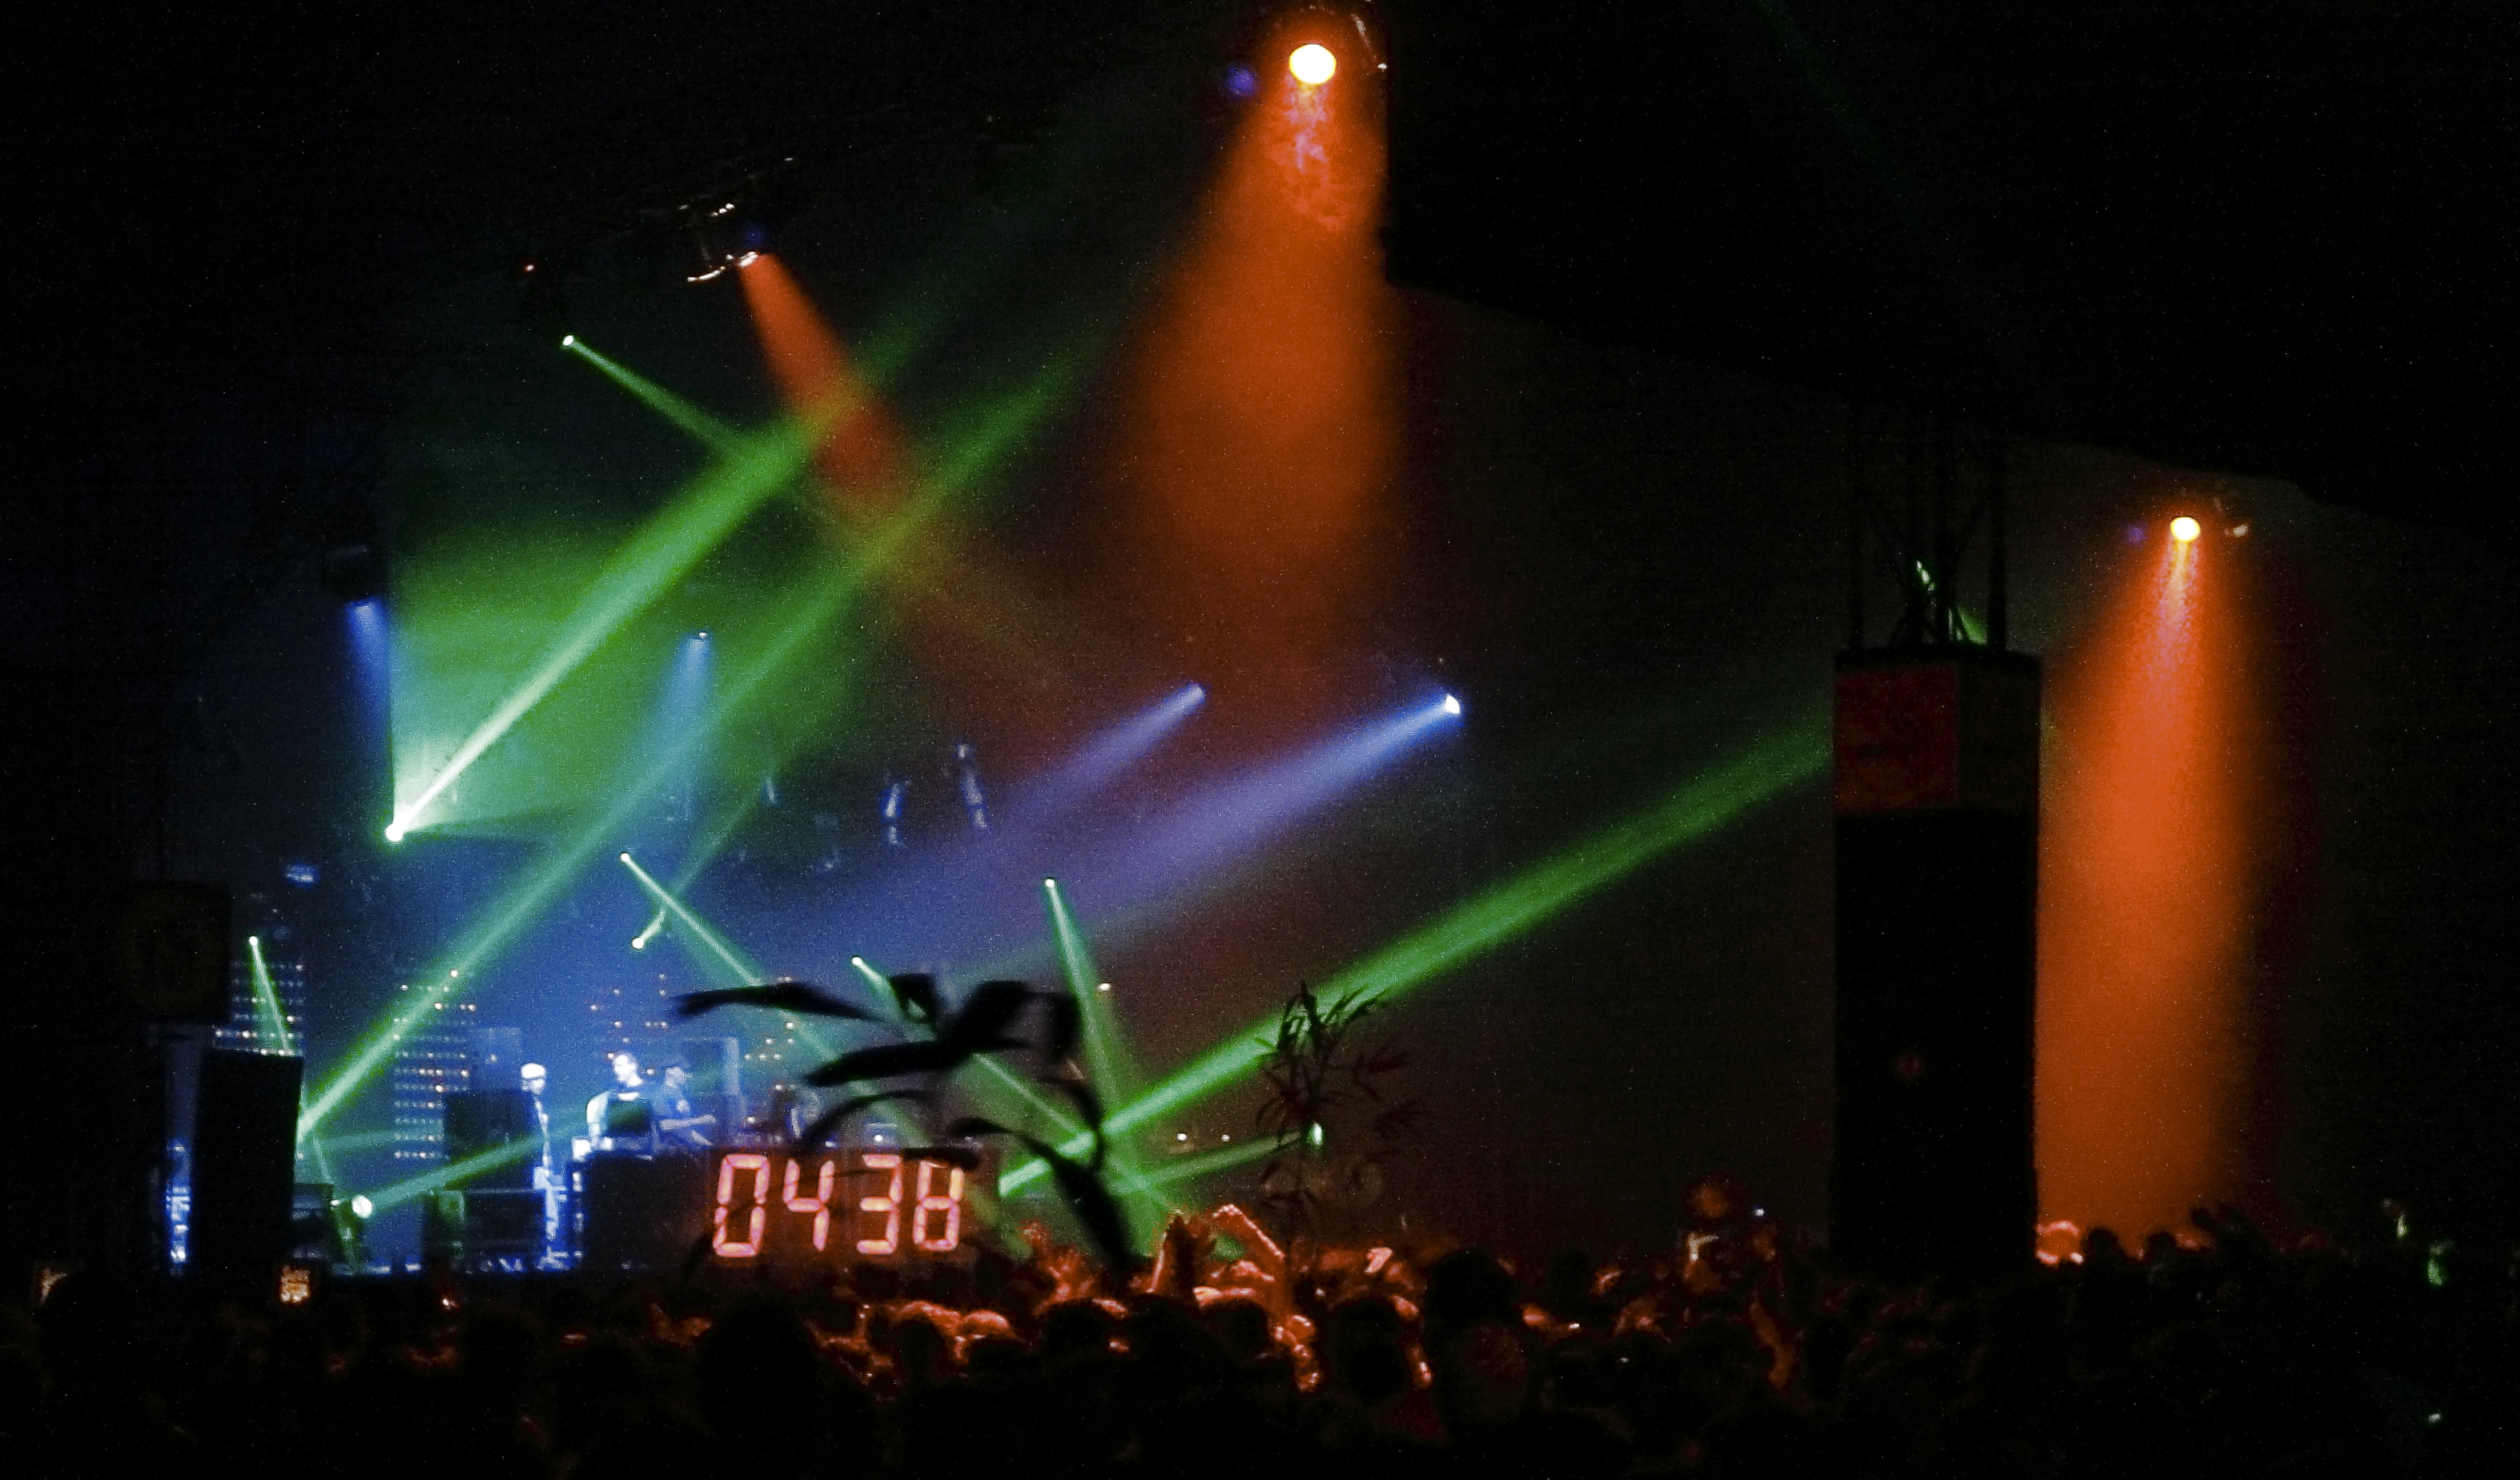 Superstijl - Jij bepaalt wat de DJ draait | 3147 x 1848 jpeg 3764kB